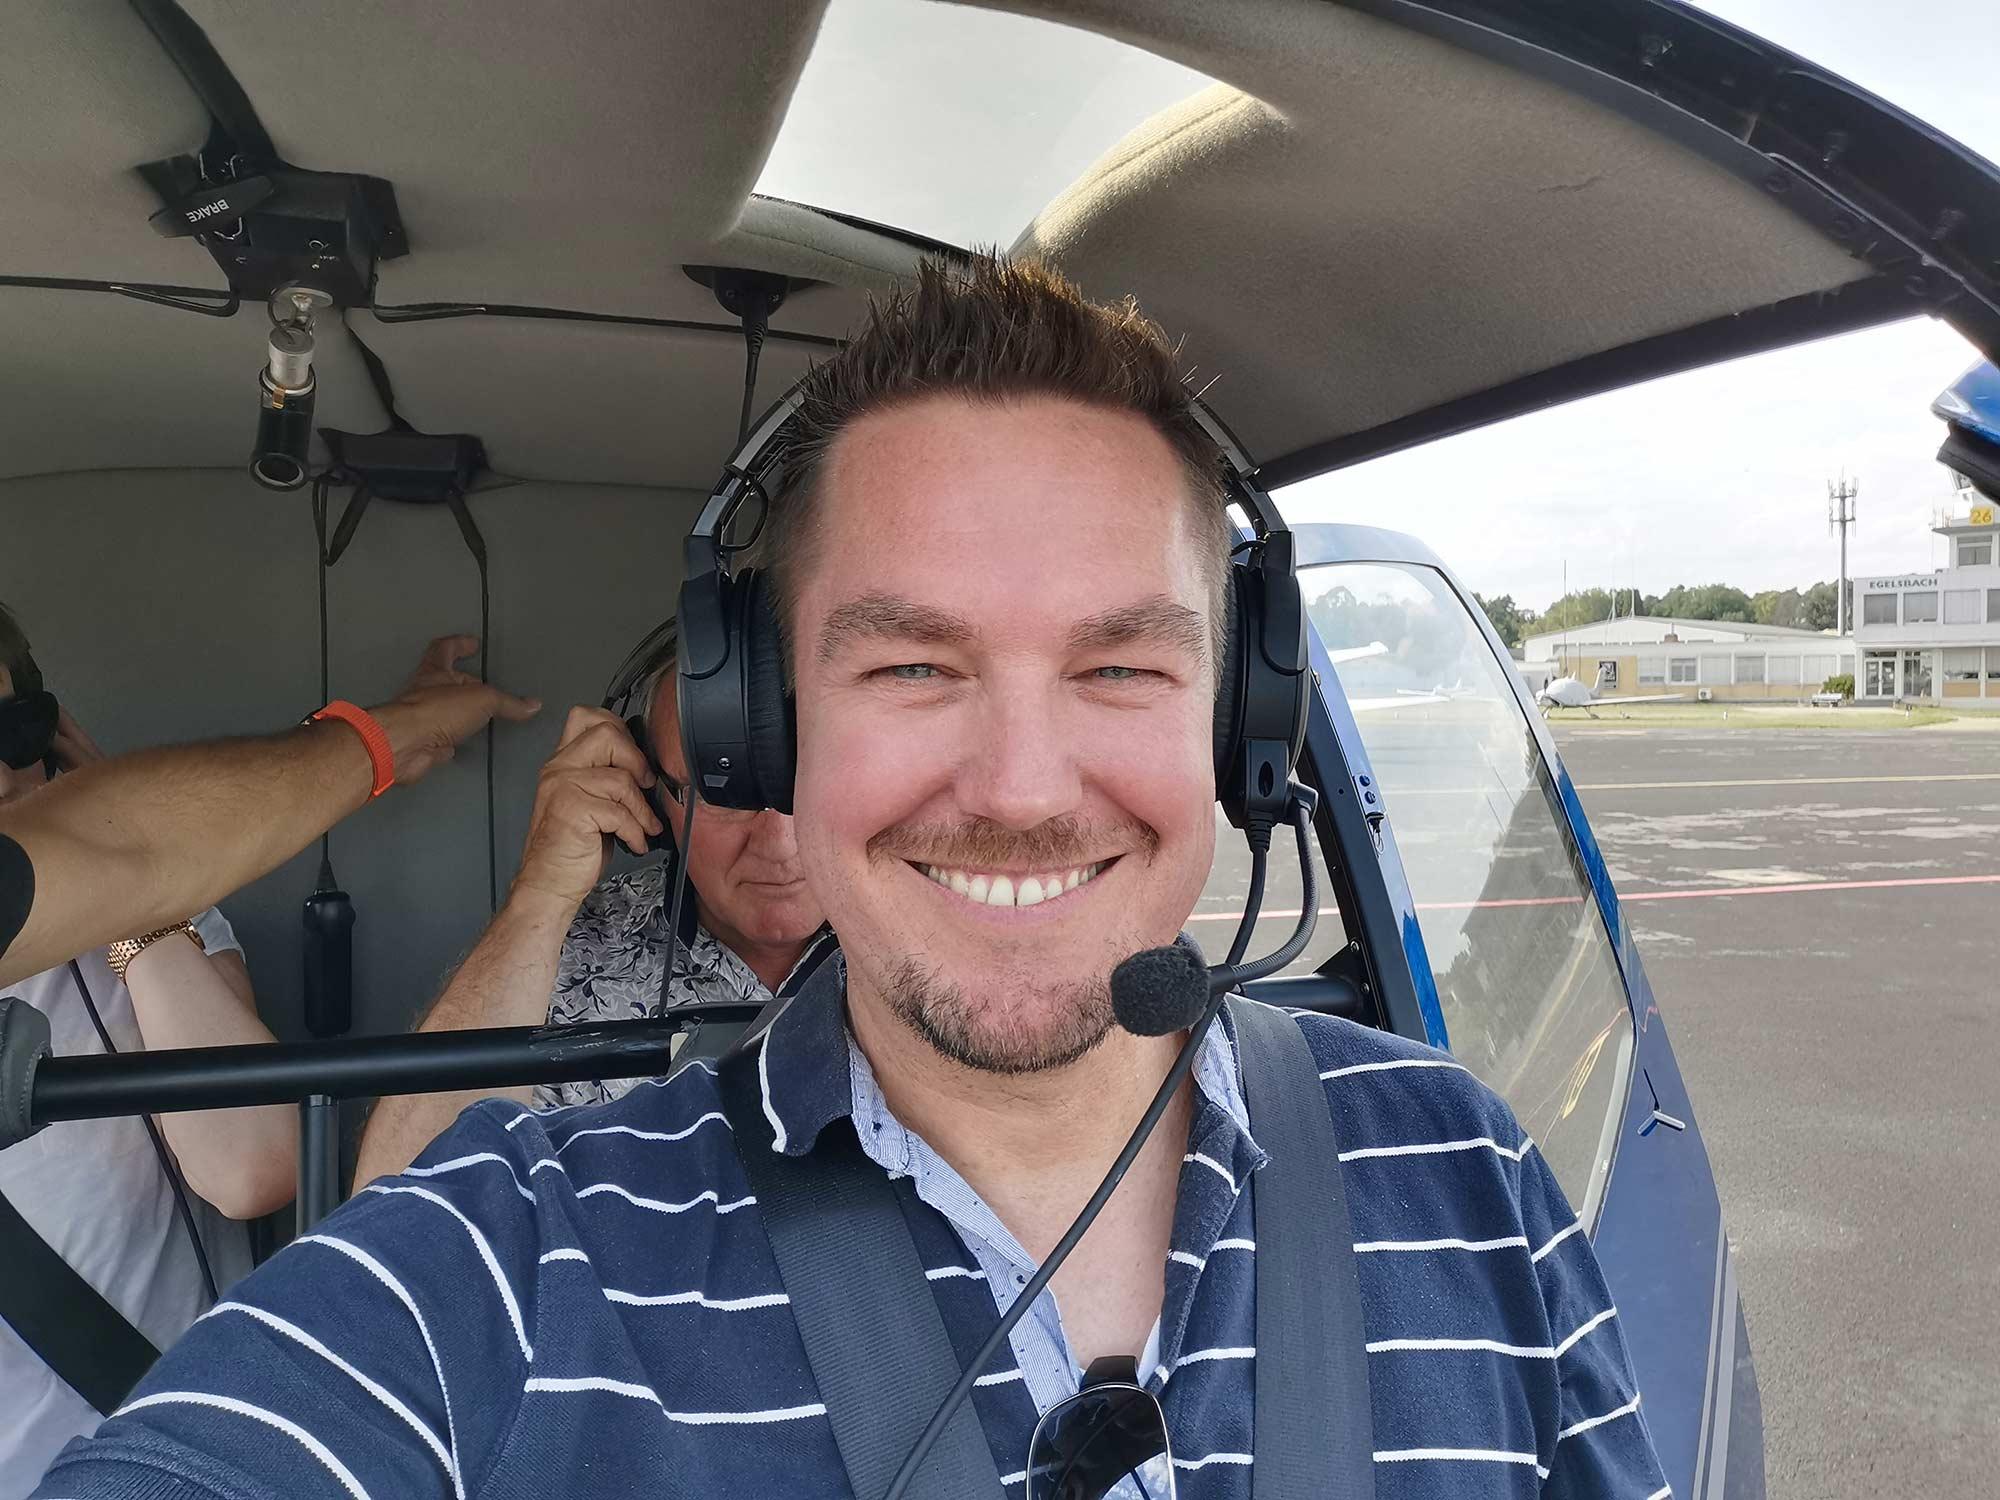 Helicopter tour Frankfurt - Passenger with headset - Skylinetour Frankfurt